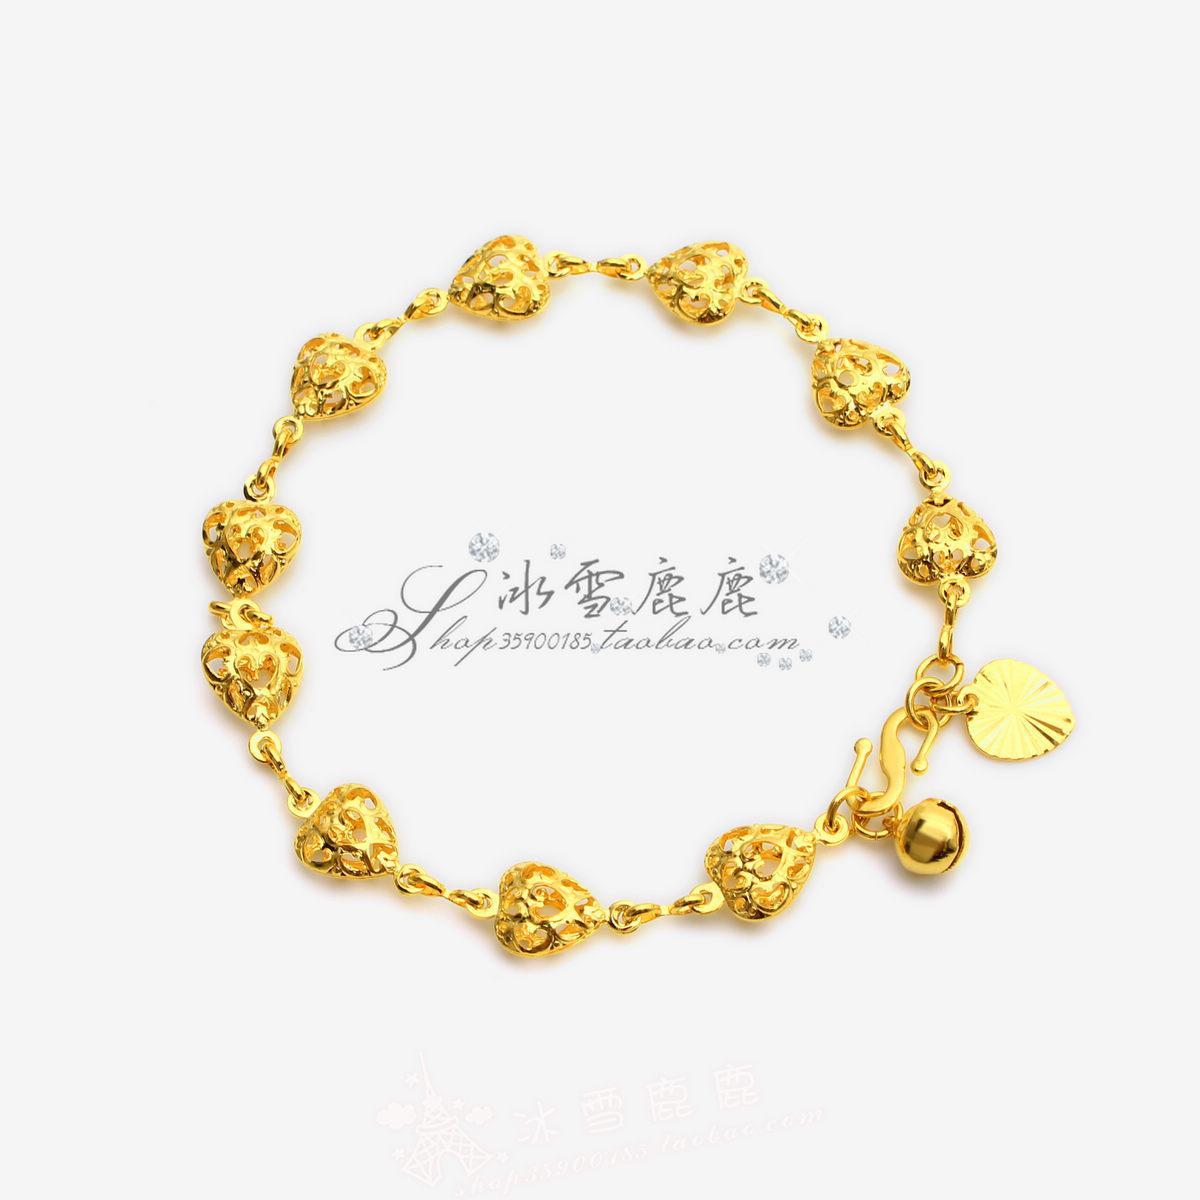 2018 Hong Kong Gold Shop New Double Heart Bracelet Bridal Wedding